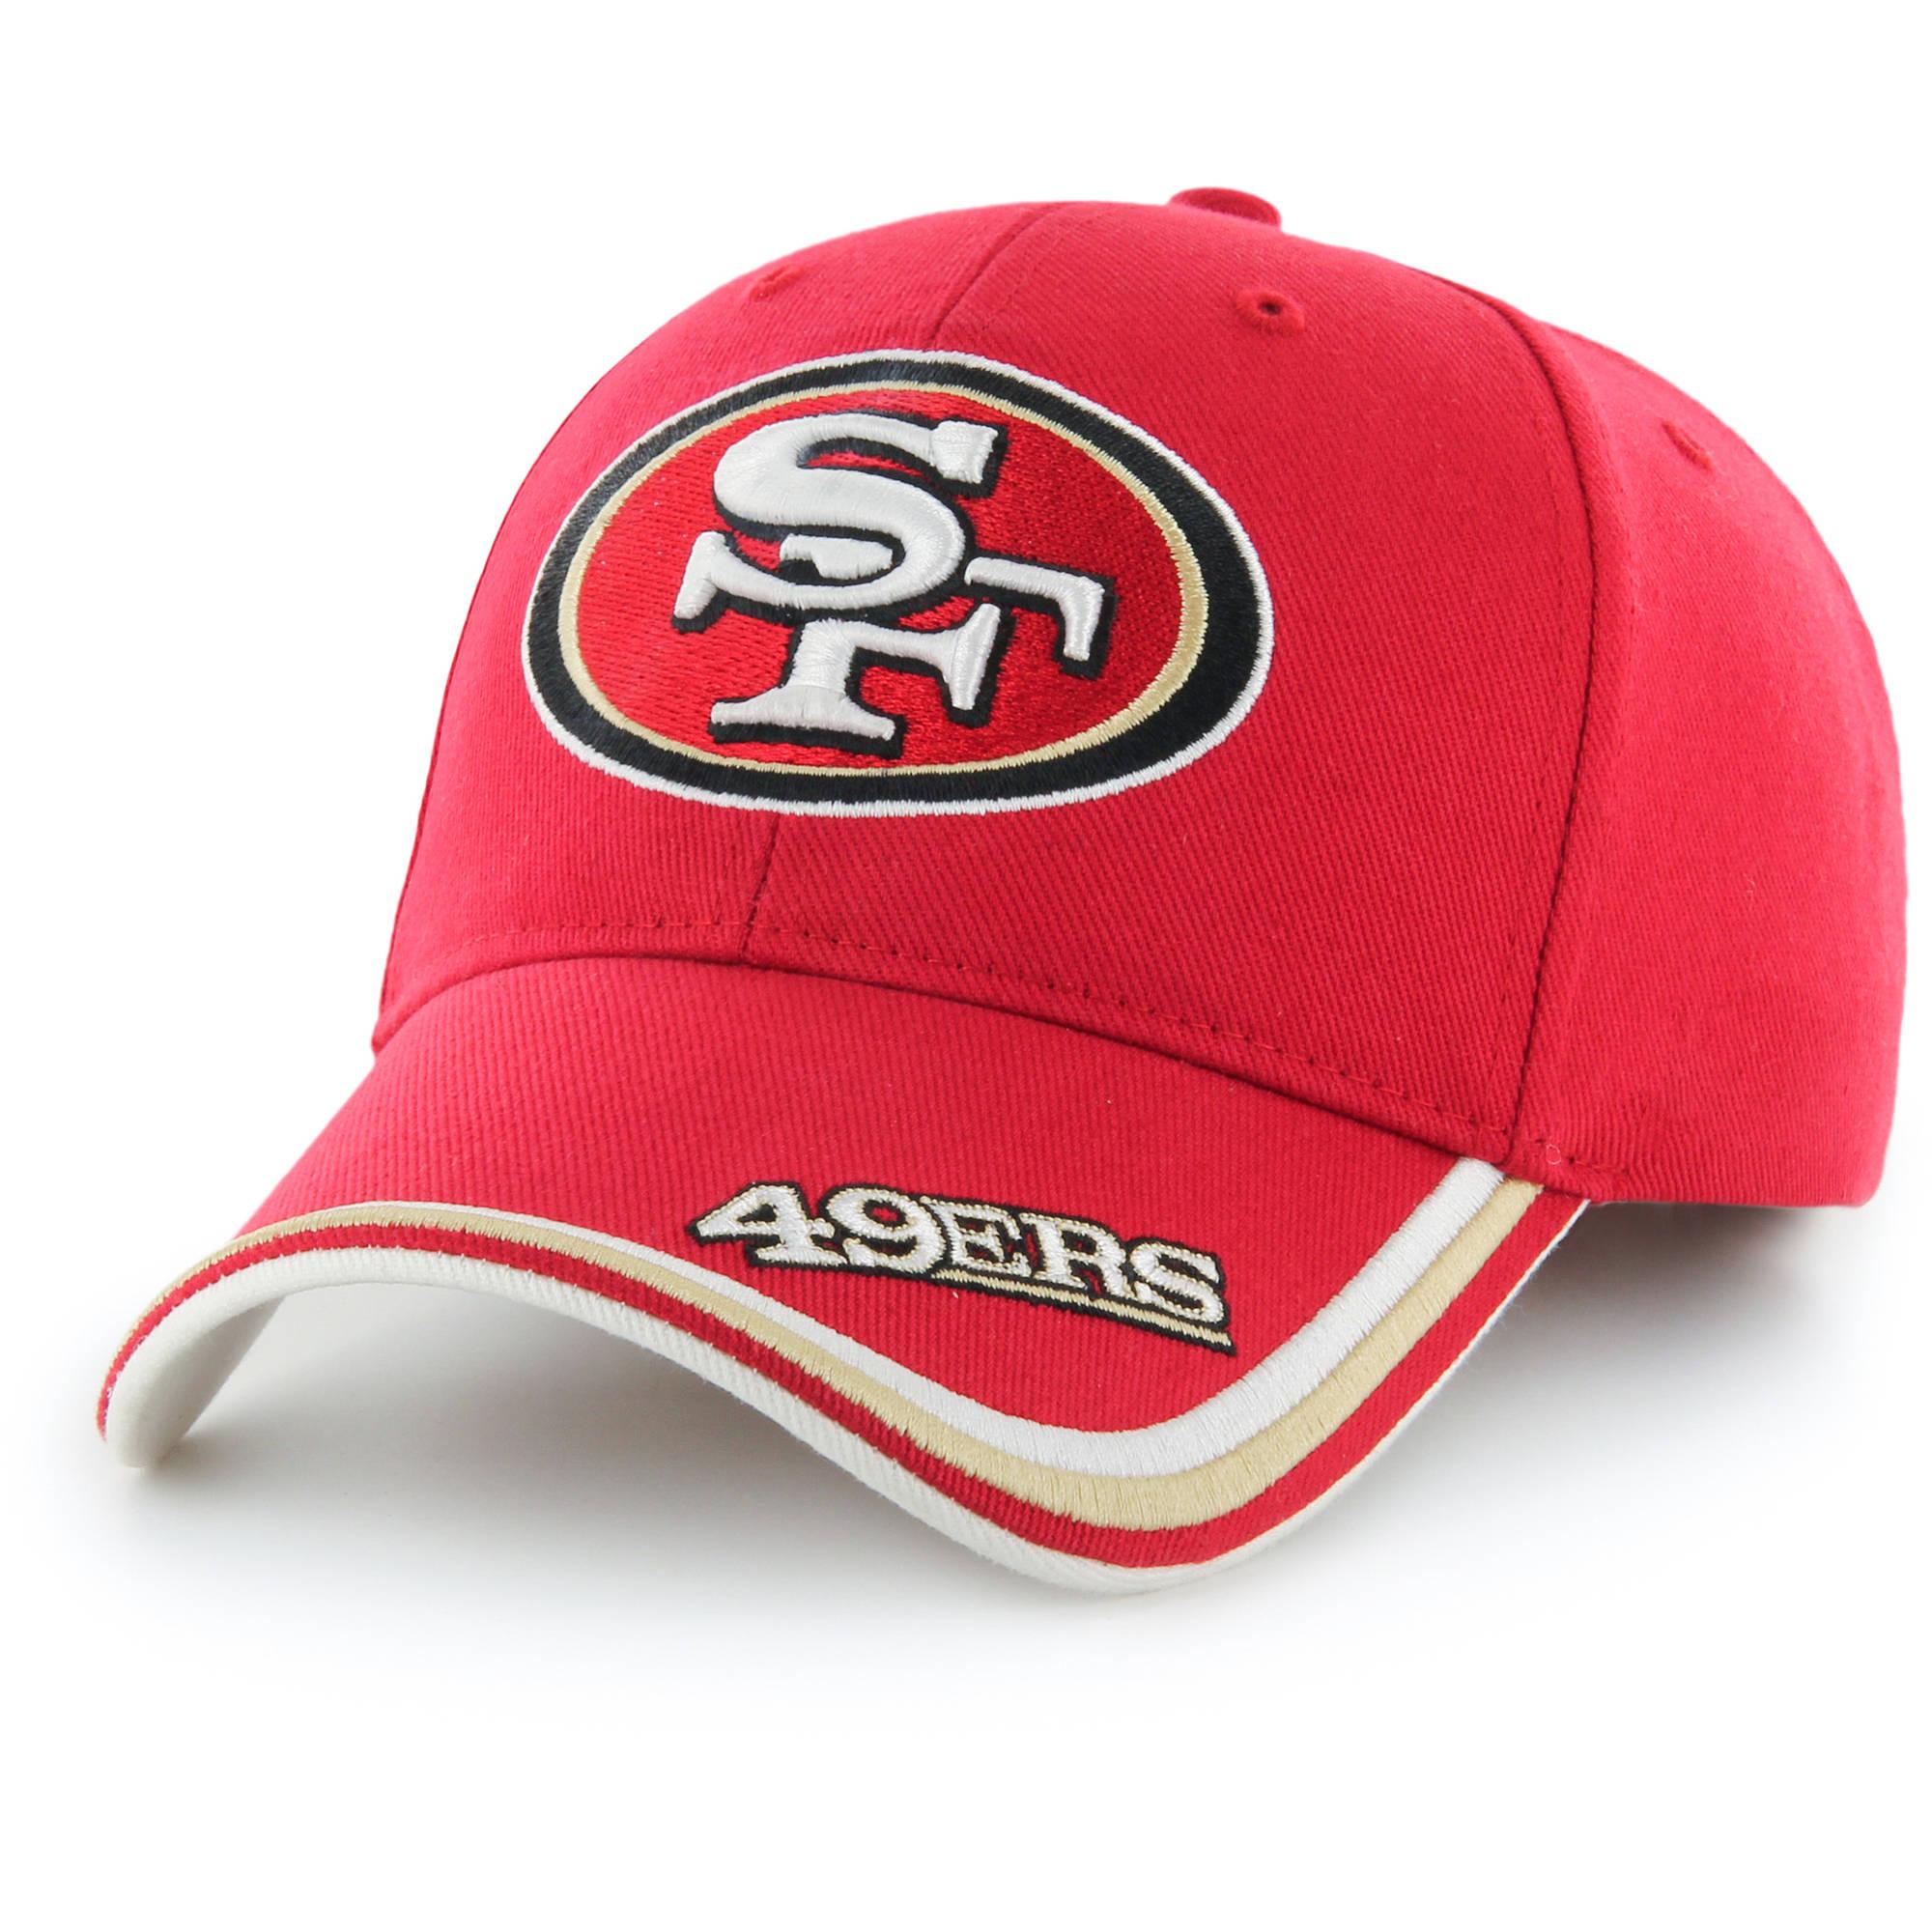 NFL San Franscisco 49ers Forest Cap / Hat by Fan Favorite